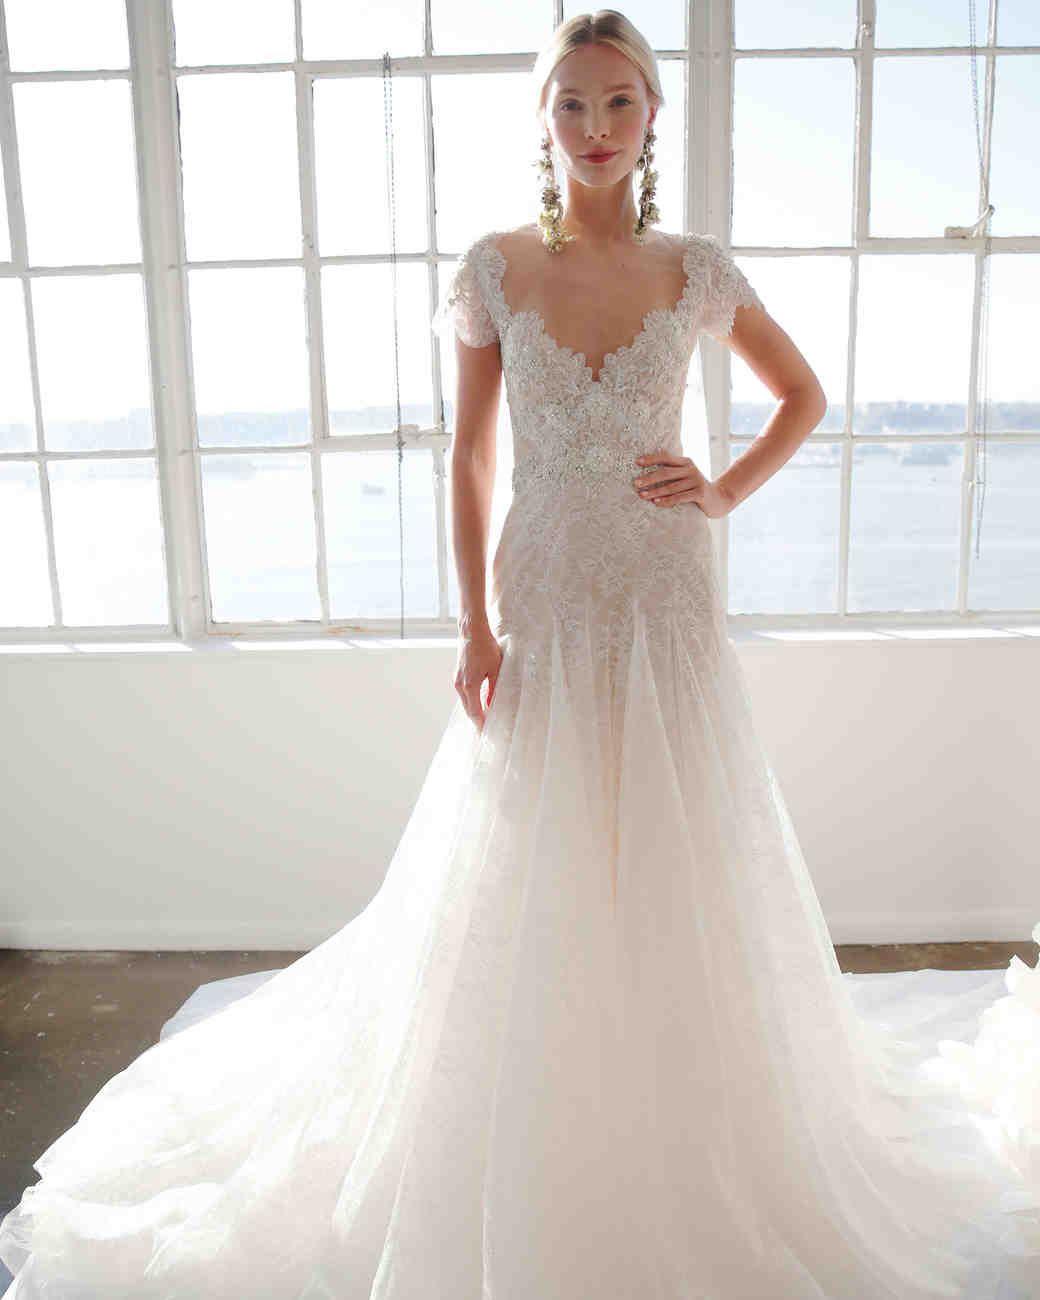 Marchesa Wedding Dress Prices - Wedding Dresses